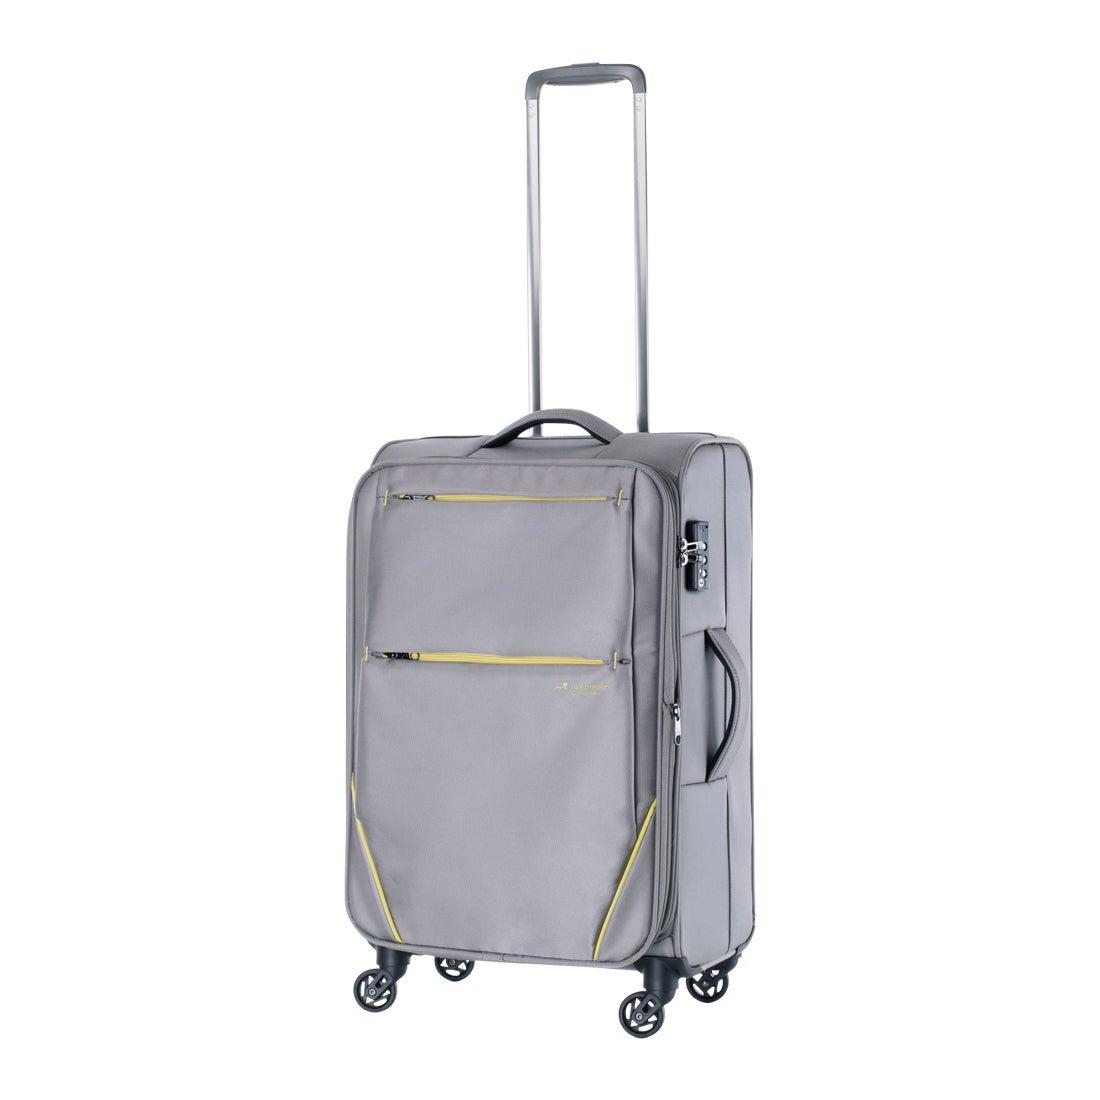 【SAC'S BAR】ヒデオワカマツ HIDEO WAKAMATSU スーツケース フライII 85-7601 57cm 【5】グレー メンズ